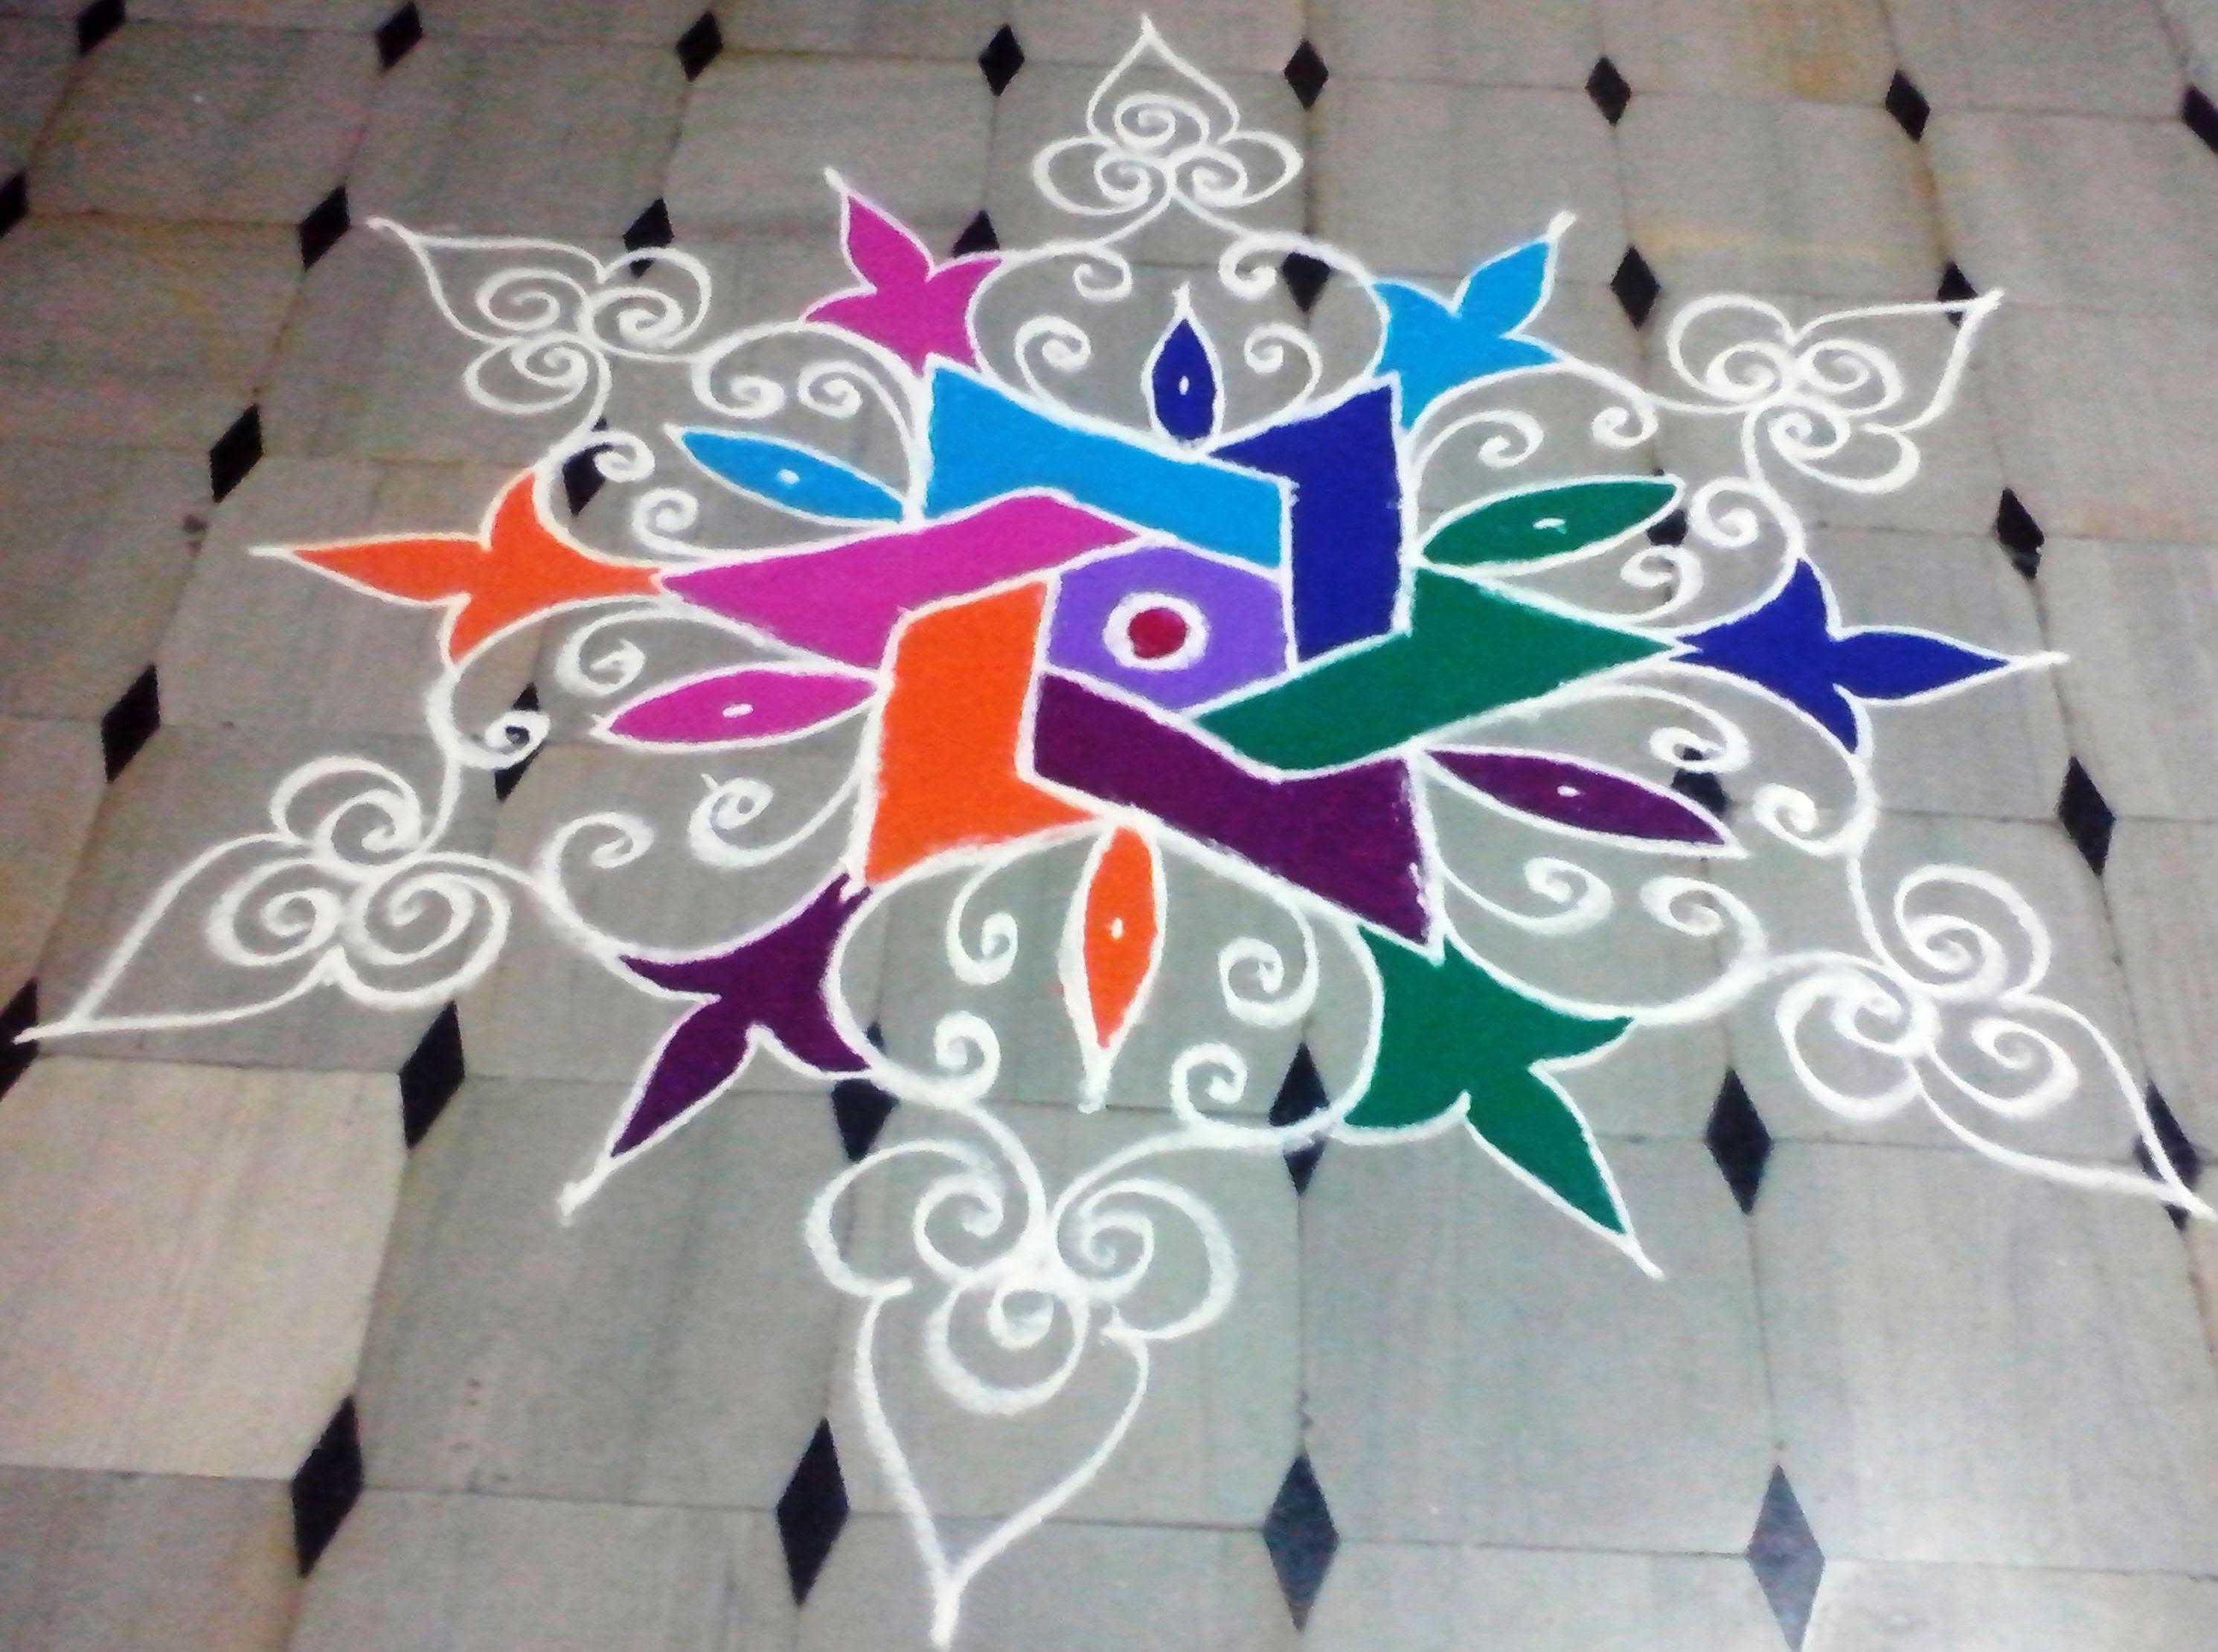 Makar Sankranti and New year 2015 Designer Rangoli   Vasu Rangoli ... for Latest Rangoli Designs With Dots For New Year 2015  51ane